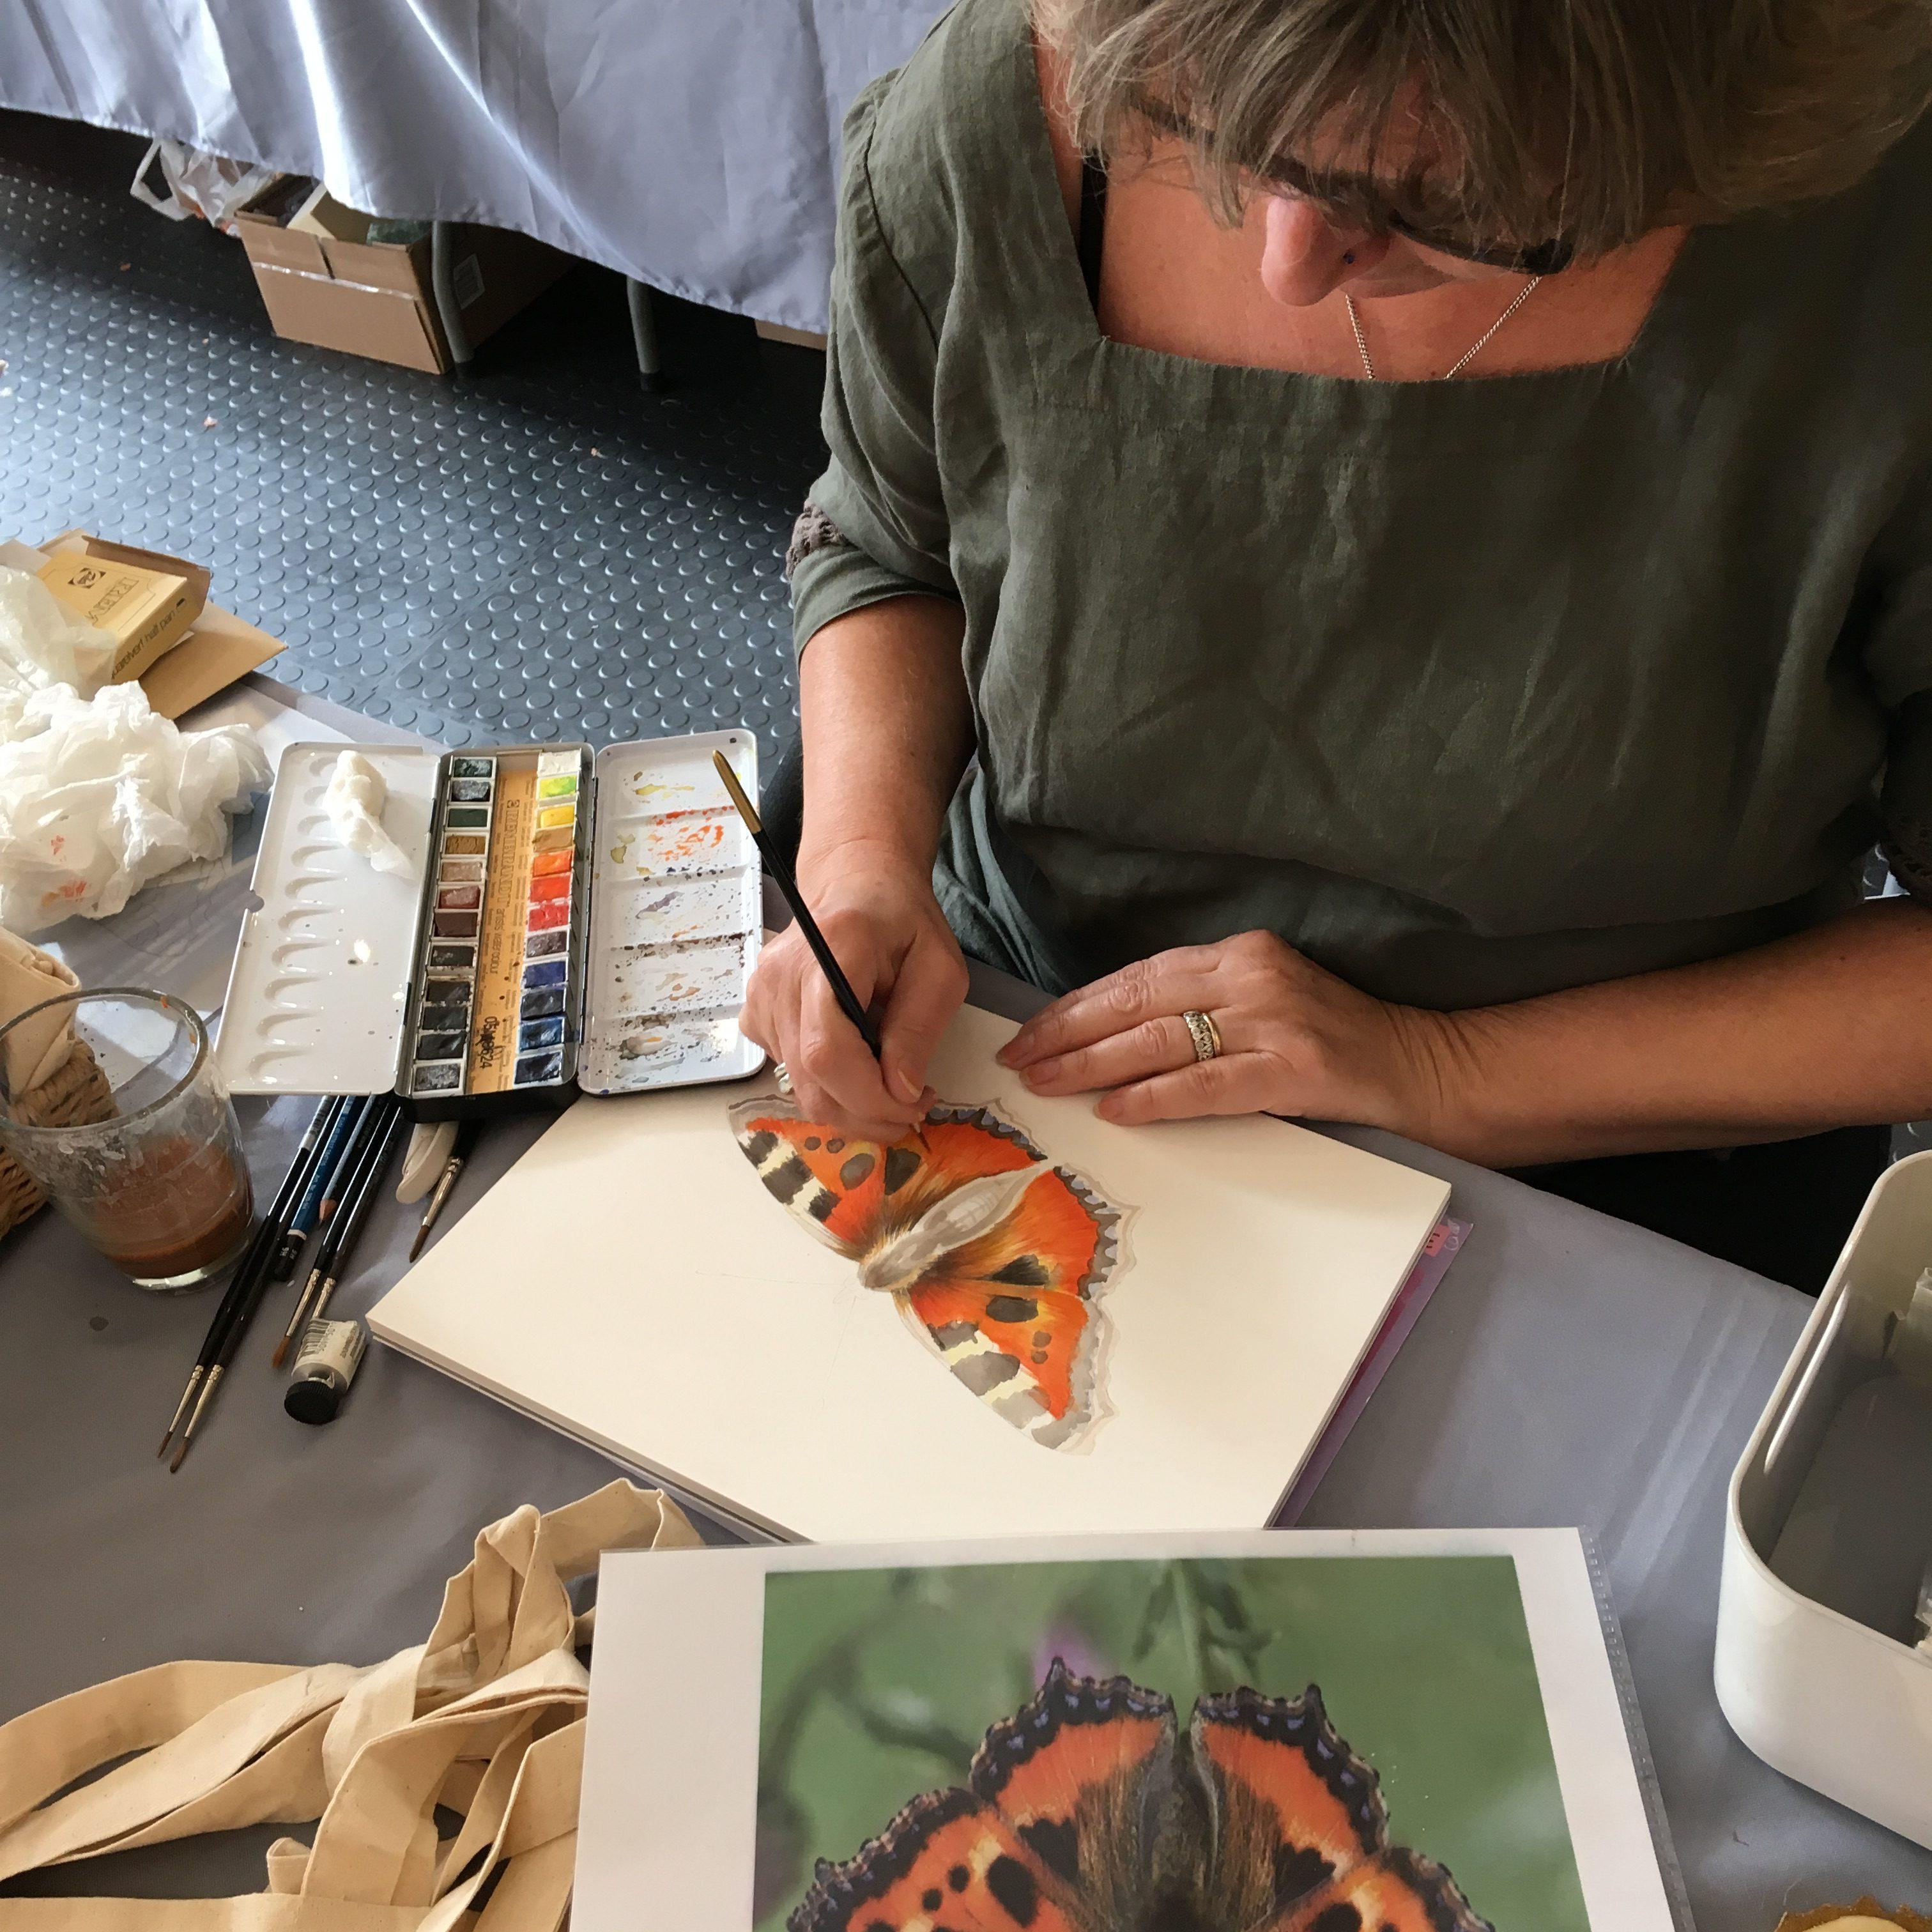 Artist painting Tortoiseshelll butterfly in watercolour